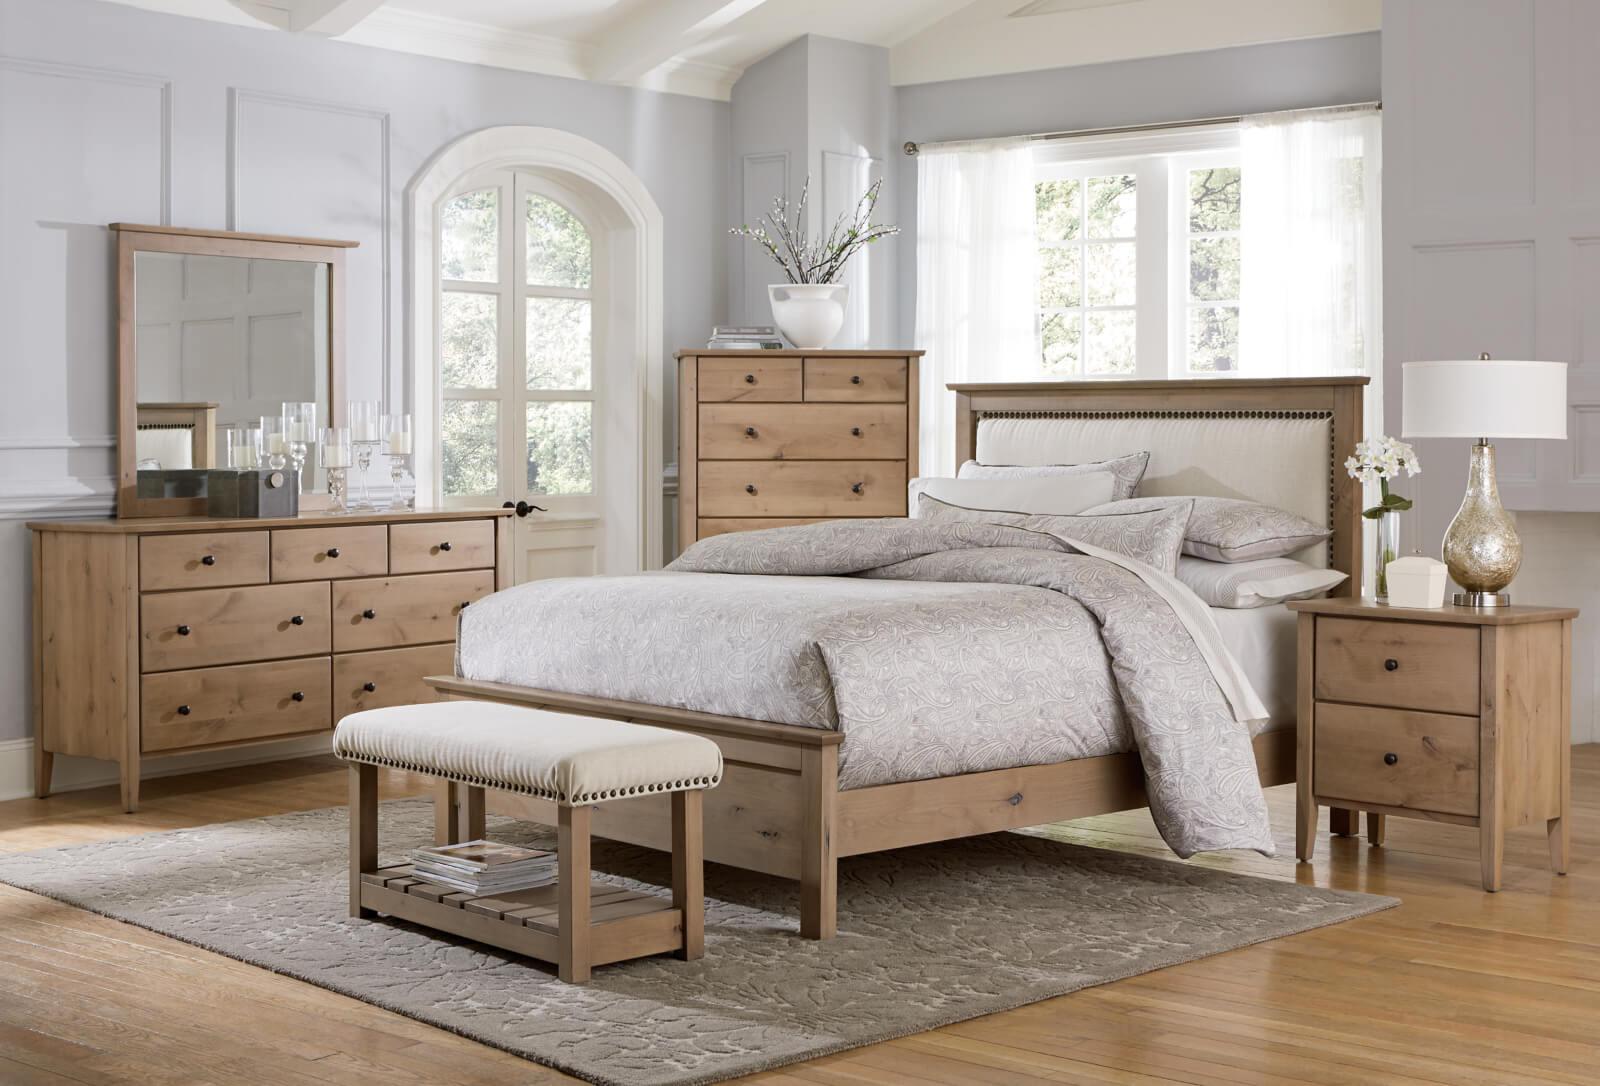 Medina Collection bedroom furniture